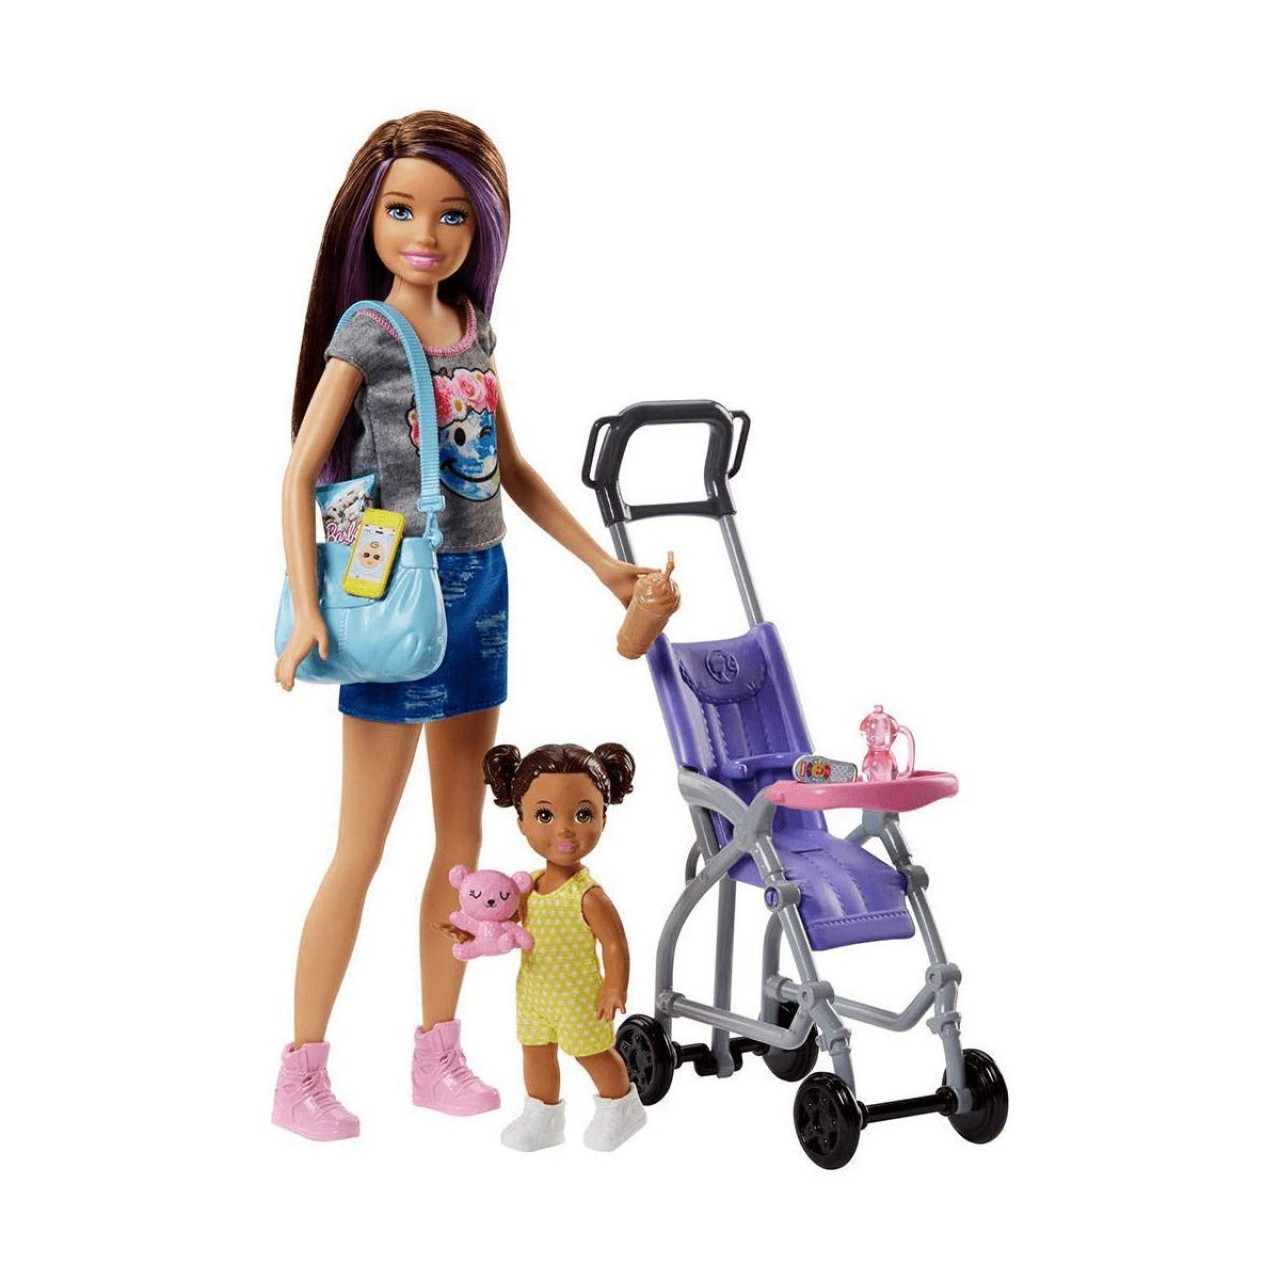 Набор Барби Скиппер няня на прогулке (FJB00) Barbie Skipper Babysitters